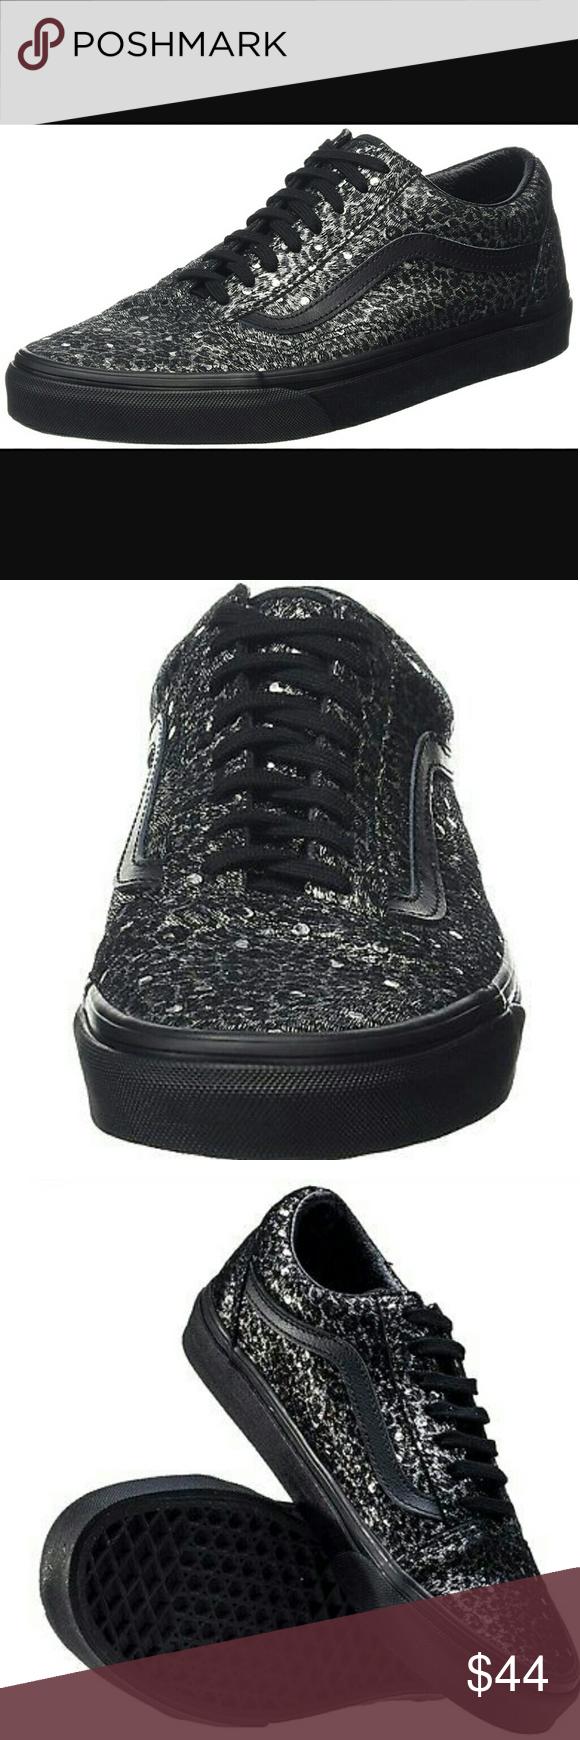 31c4f95947a724 New Vans Old Skool Metallic Leopard Sneakers New Unisex Vans Old Skool  Metallic Leopard Sneakers. Men s Size 7 Women s size 8.5. The Vans classic  skate shoe ...